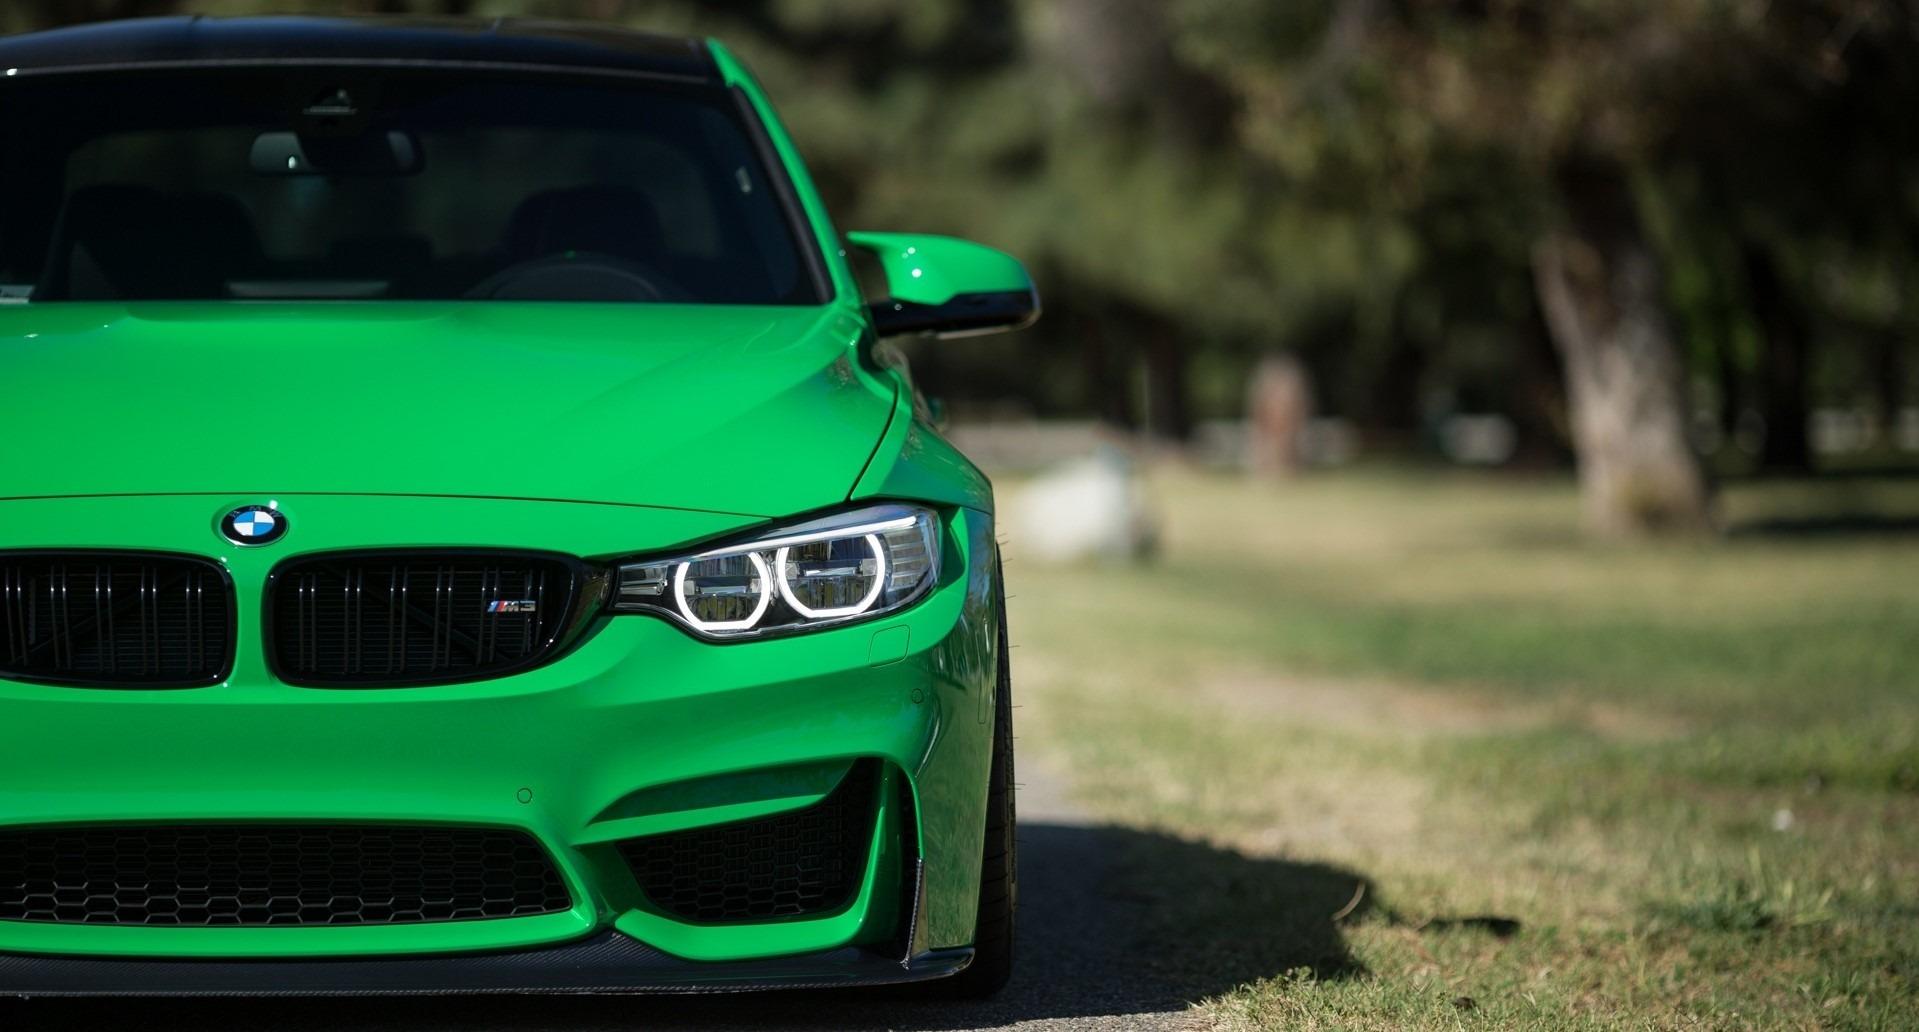 Green BMW in Eagan, Minnesota - GoodwillCarDonation.org